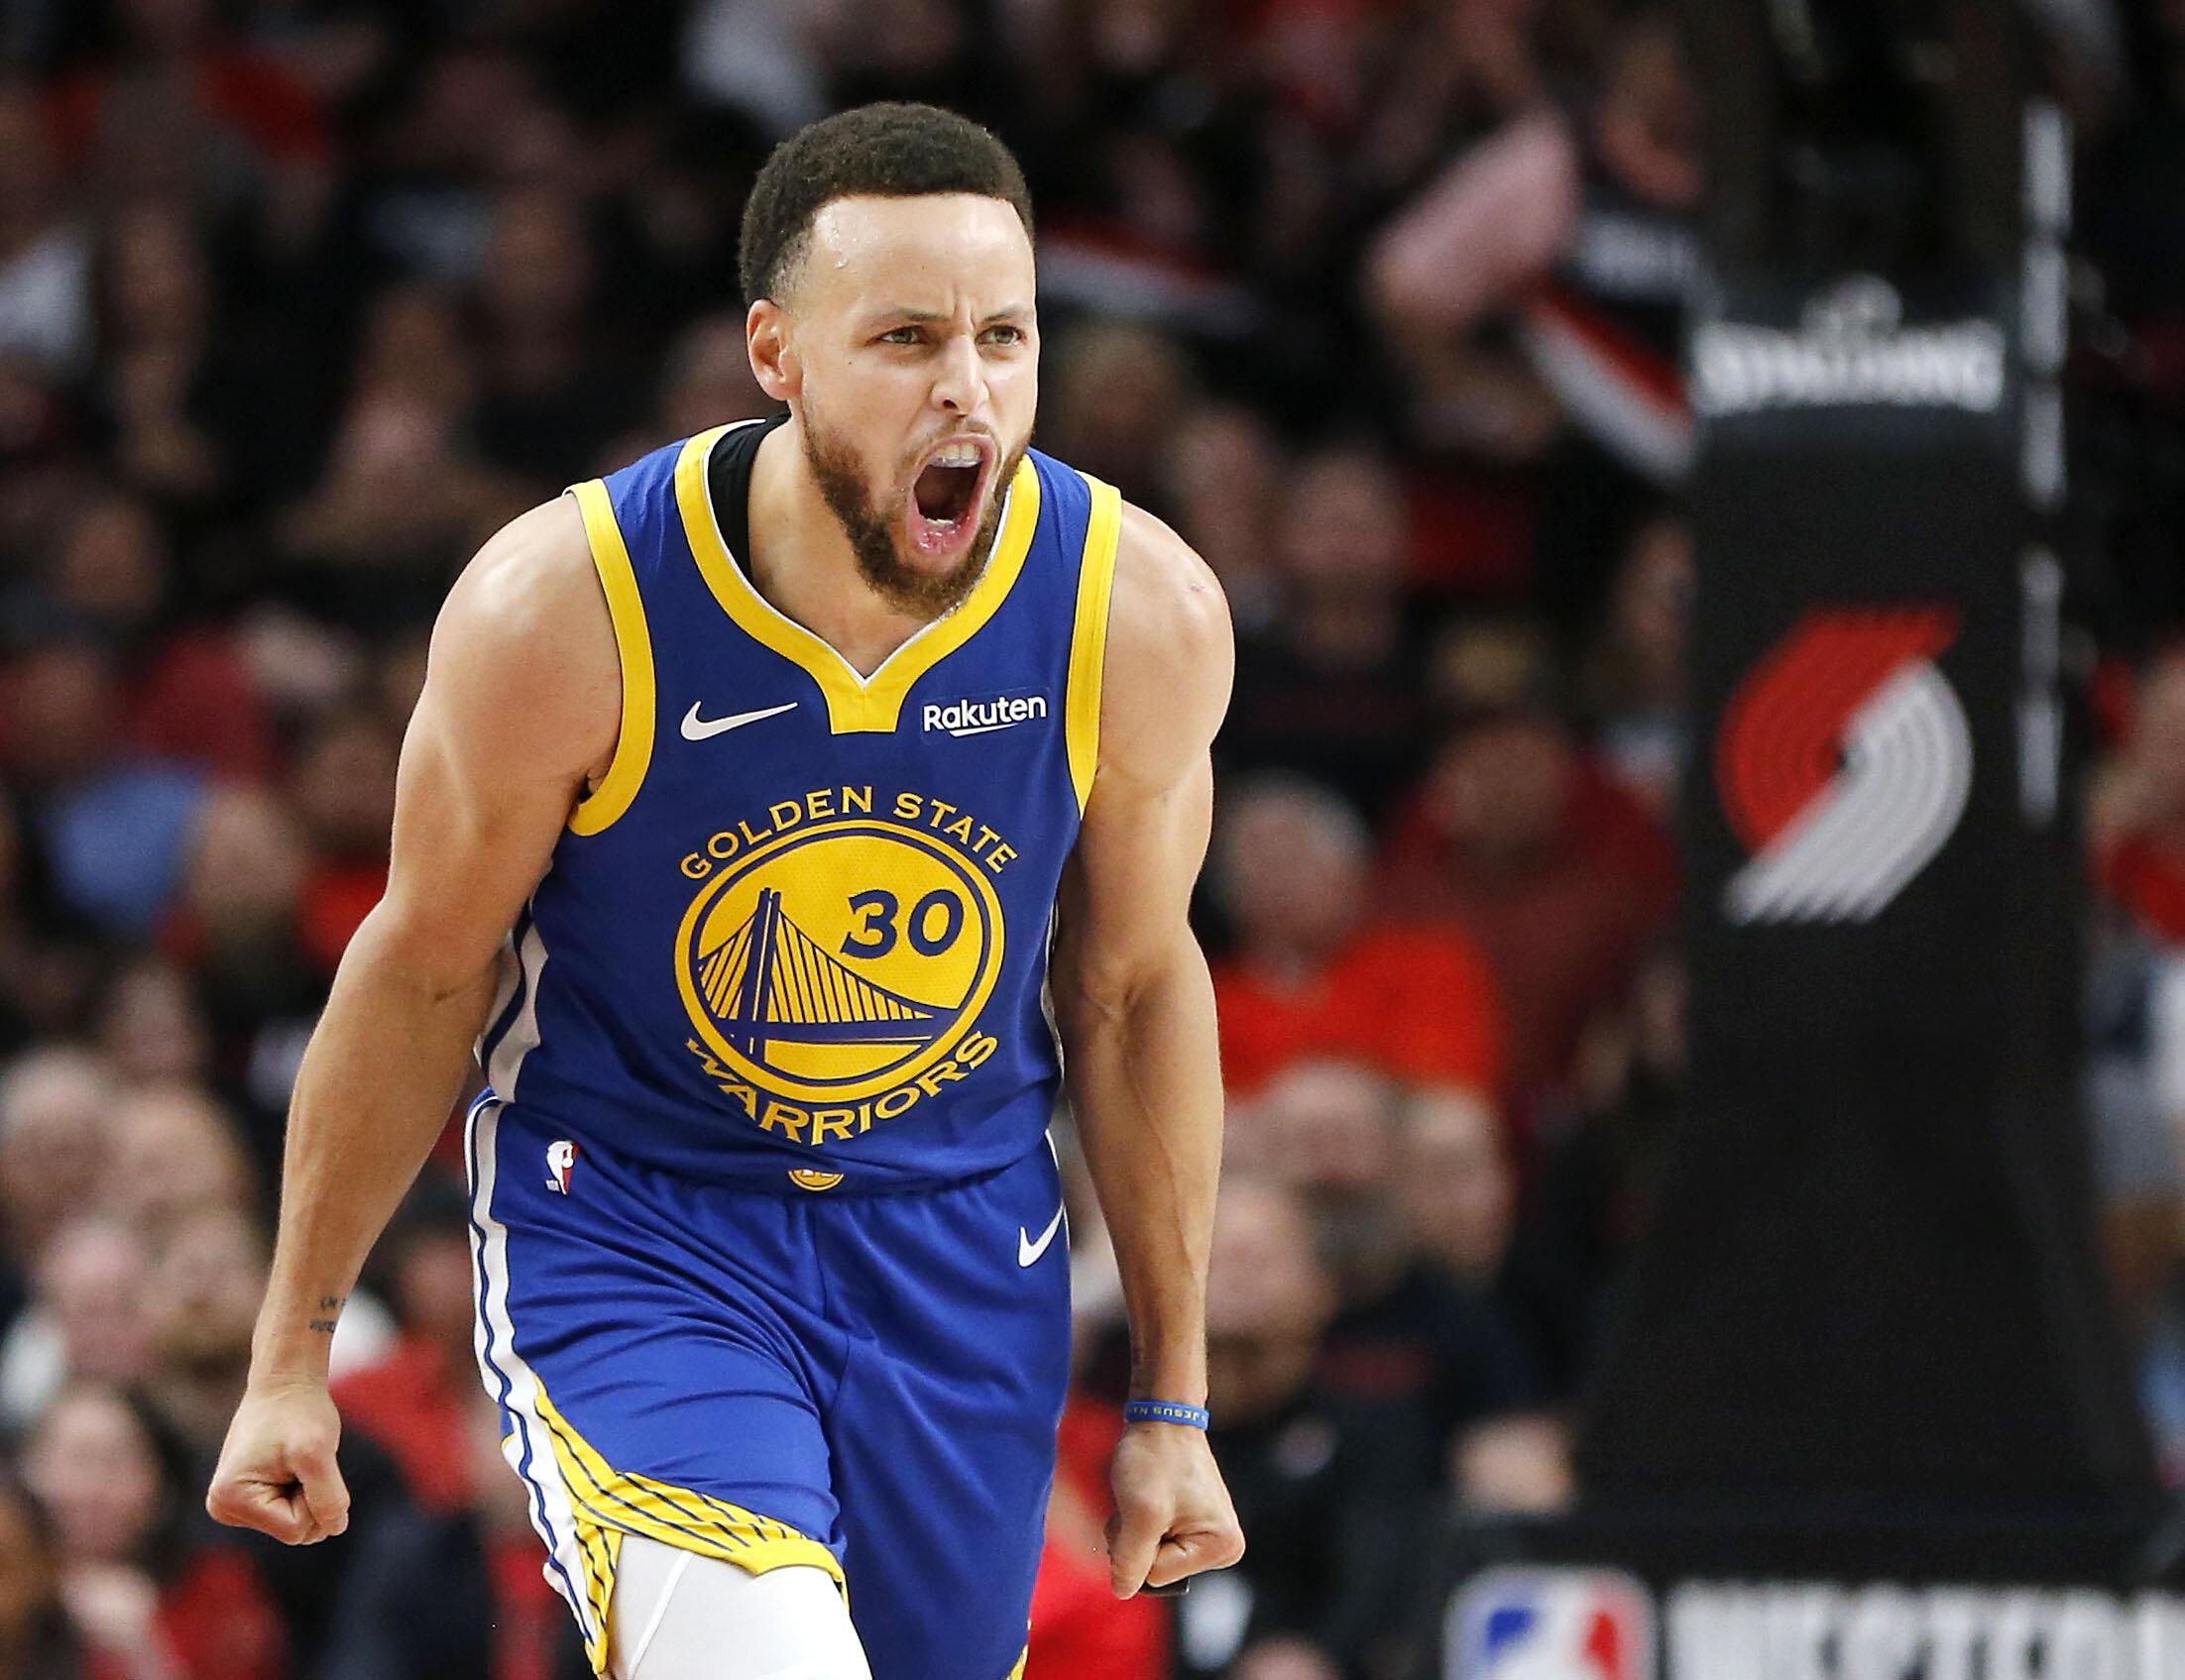 Nba Steph Curry: 4MP's Top 50 NBA Players 2019-20 SZN (No. 9-5)